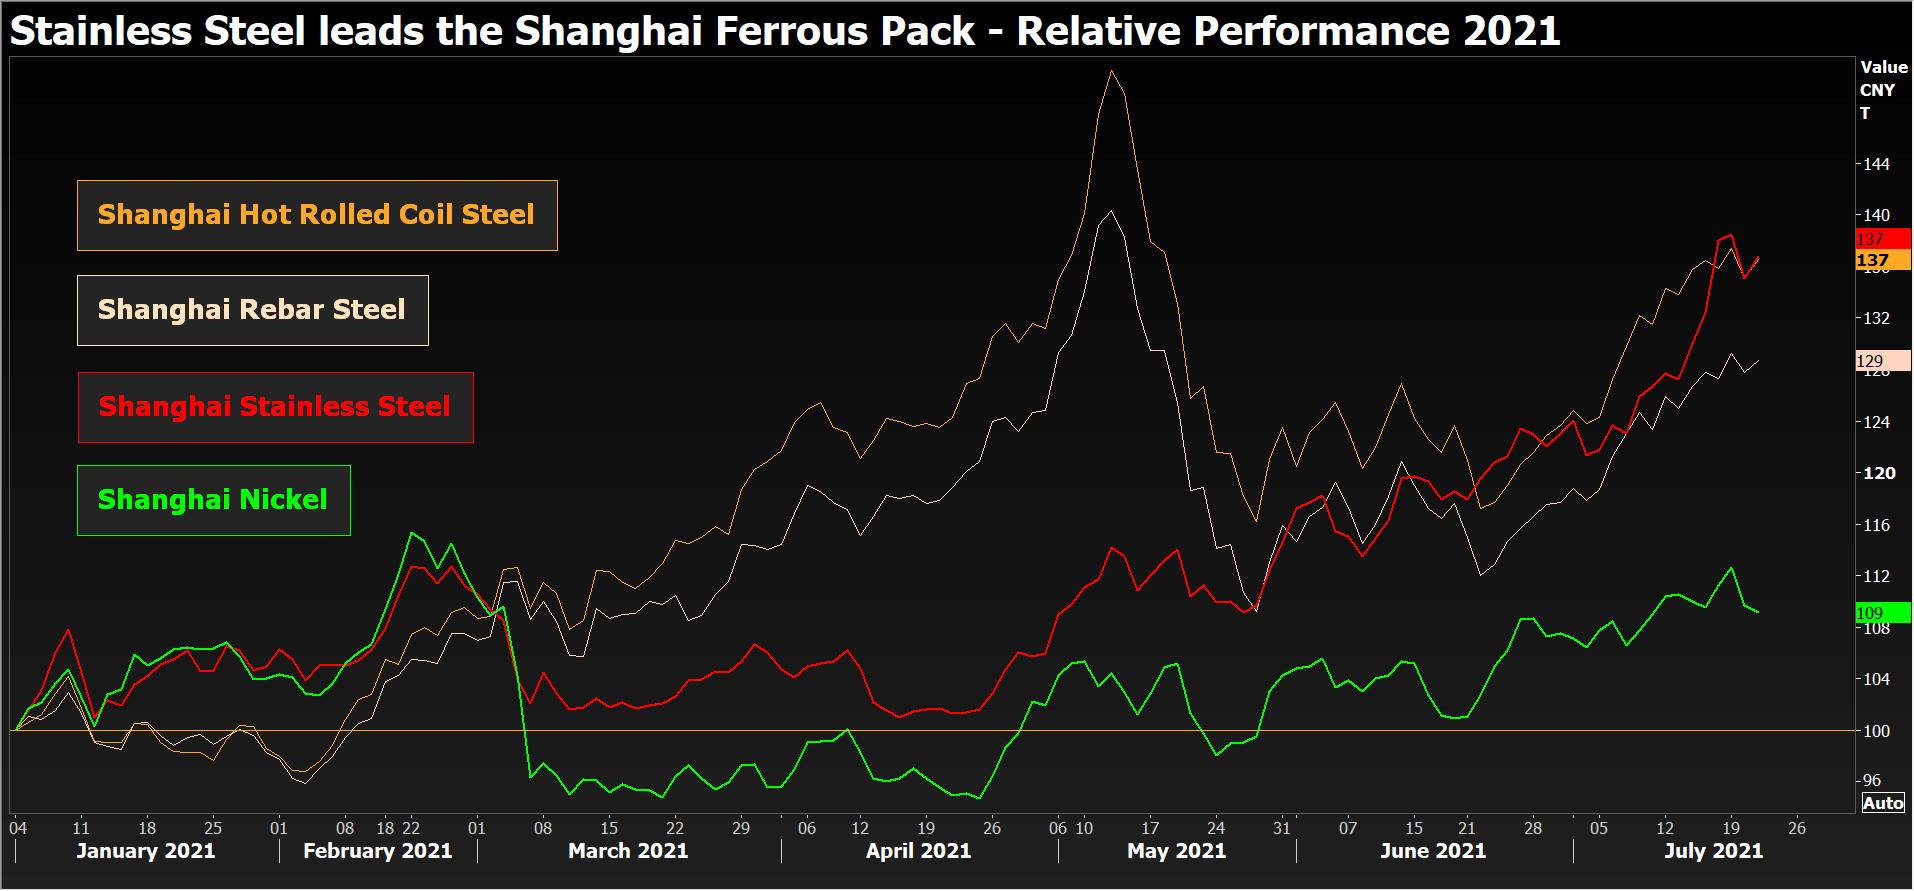 stainless steel leads the Shanghai Ferrous pack